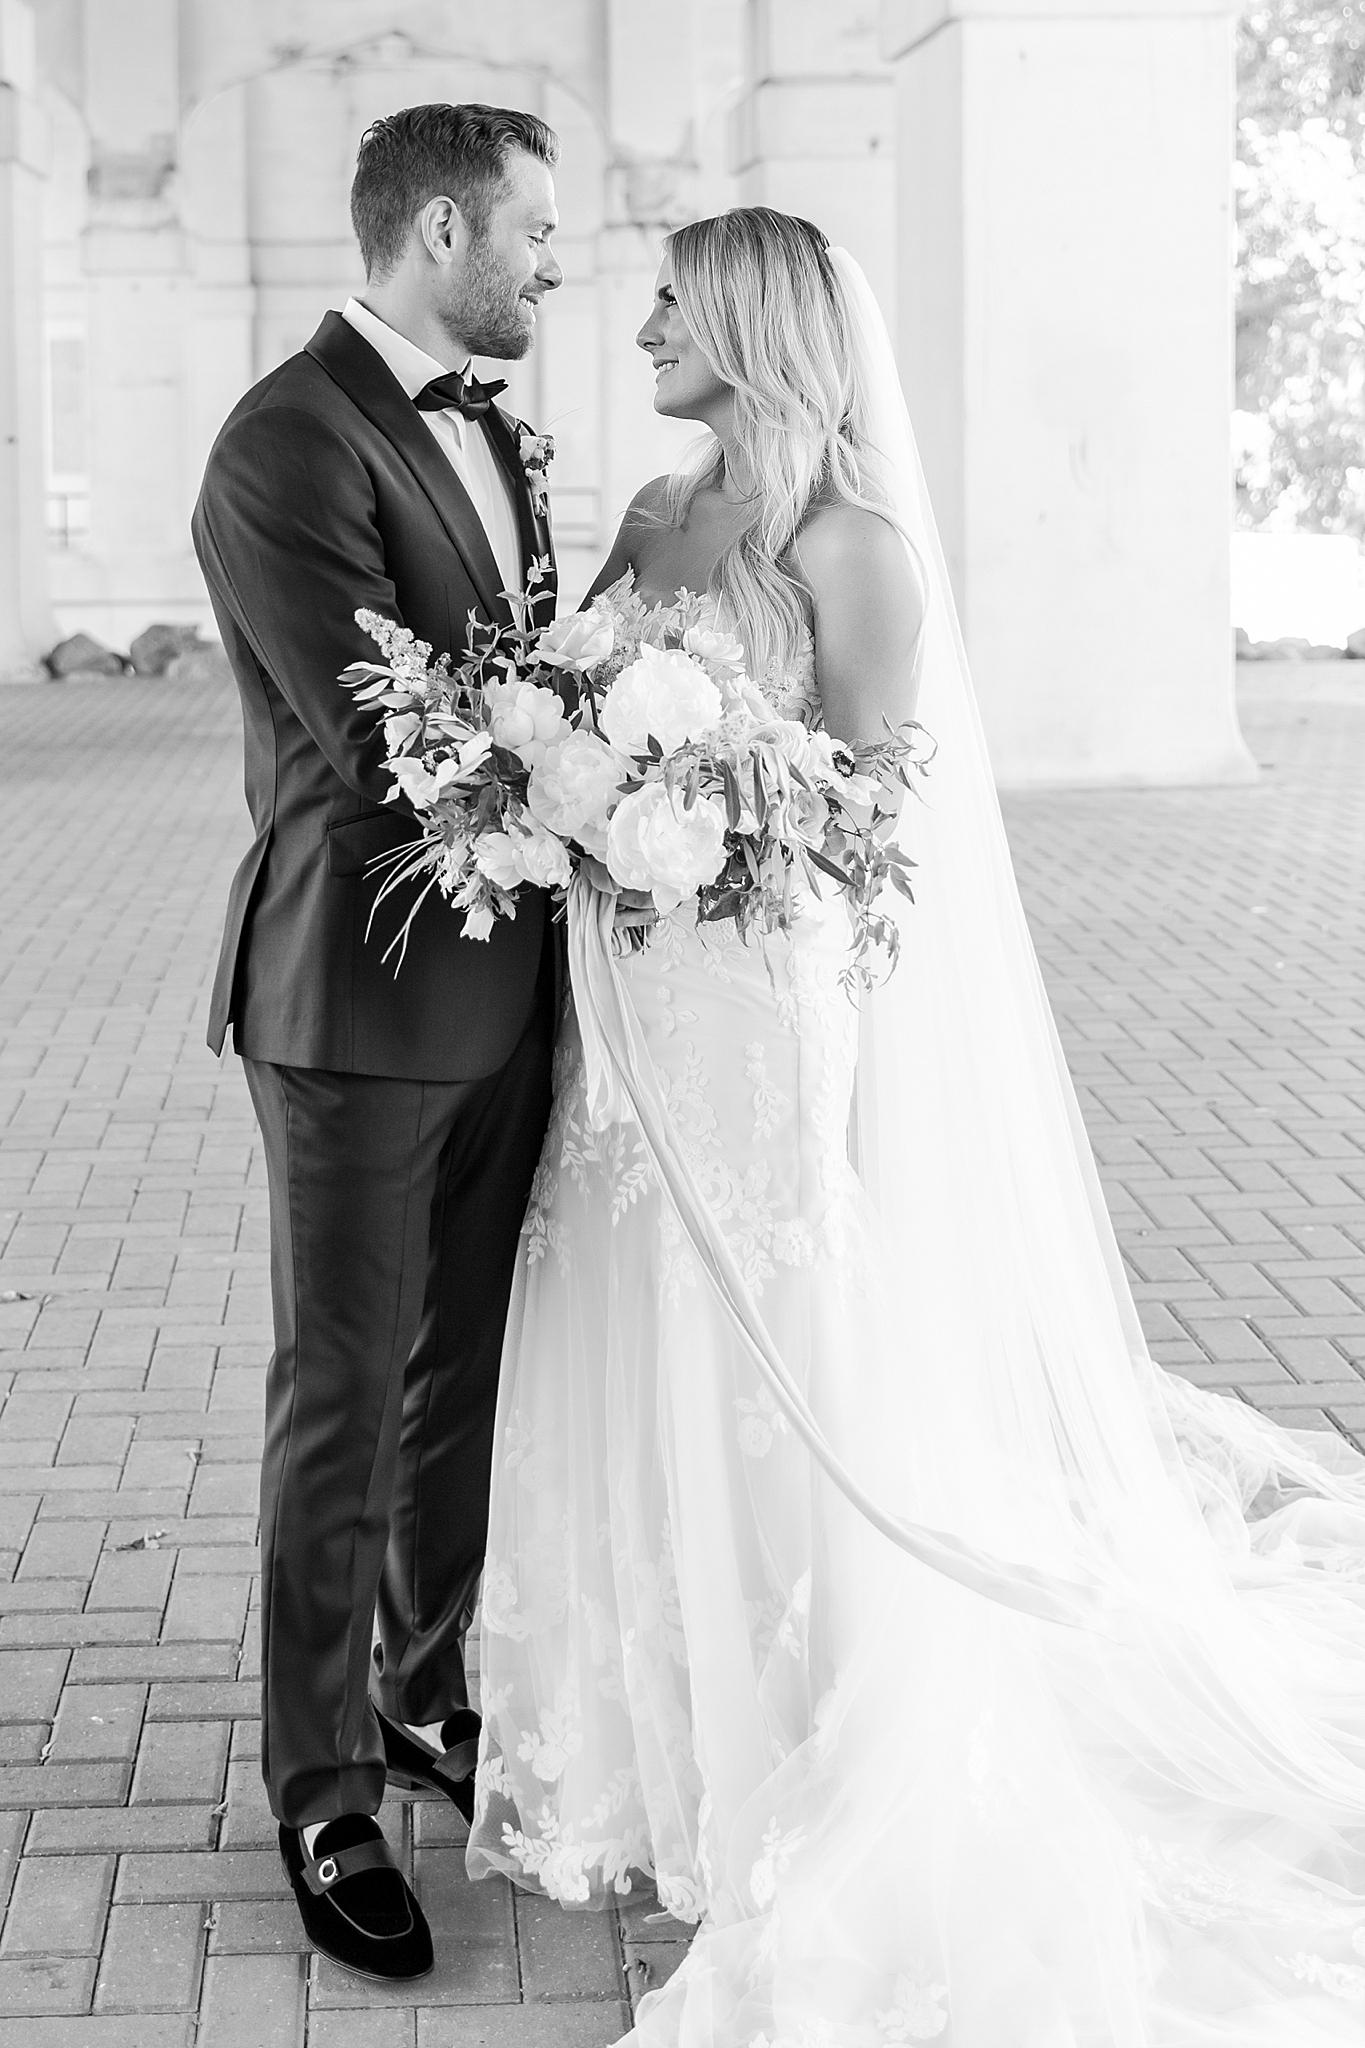 detroit-wedding-photographer-ann-arbor-chicago-by-courtney-carolyn-photography_0019.jpg